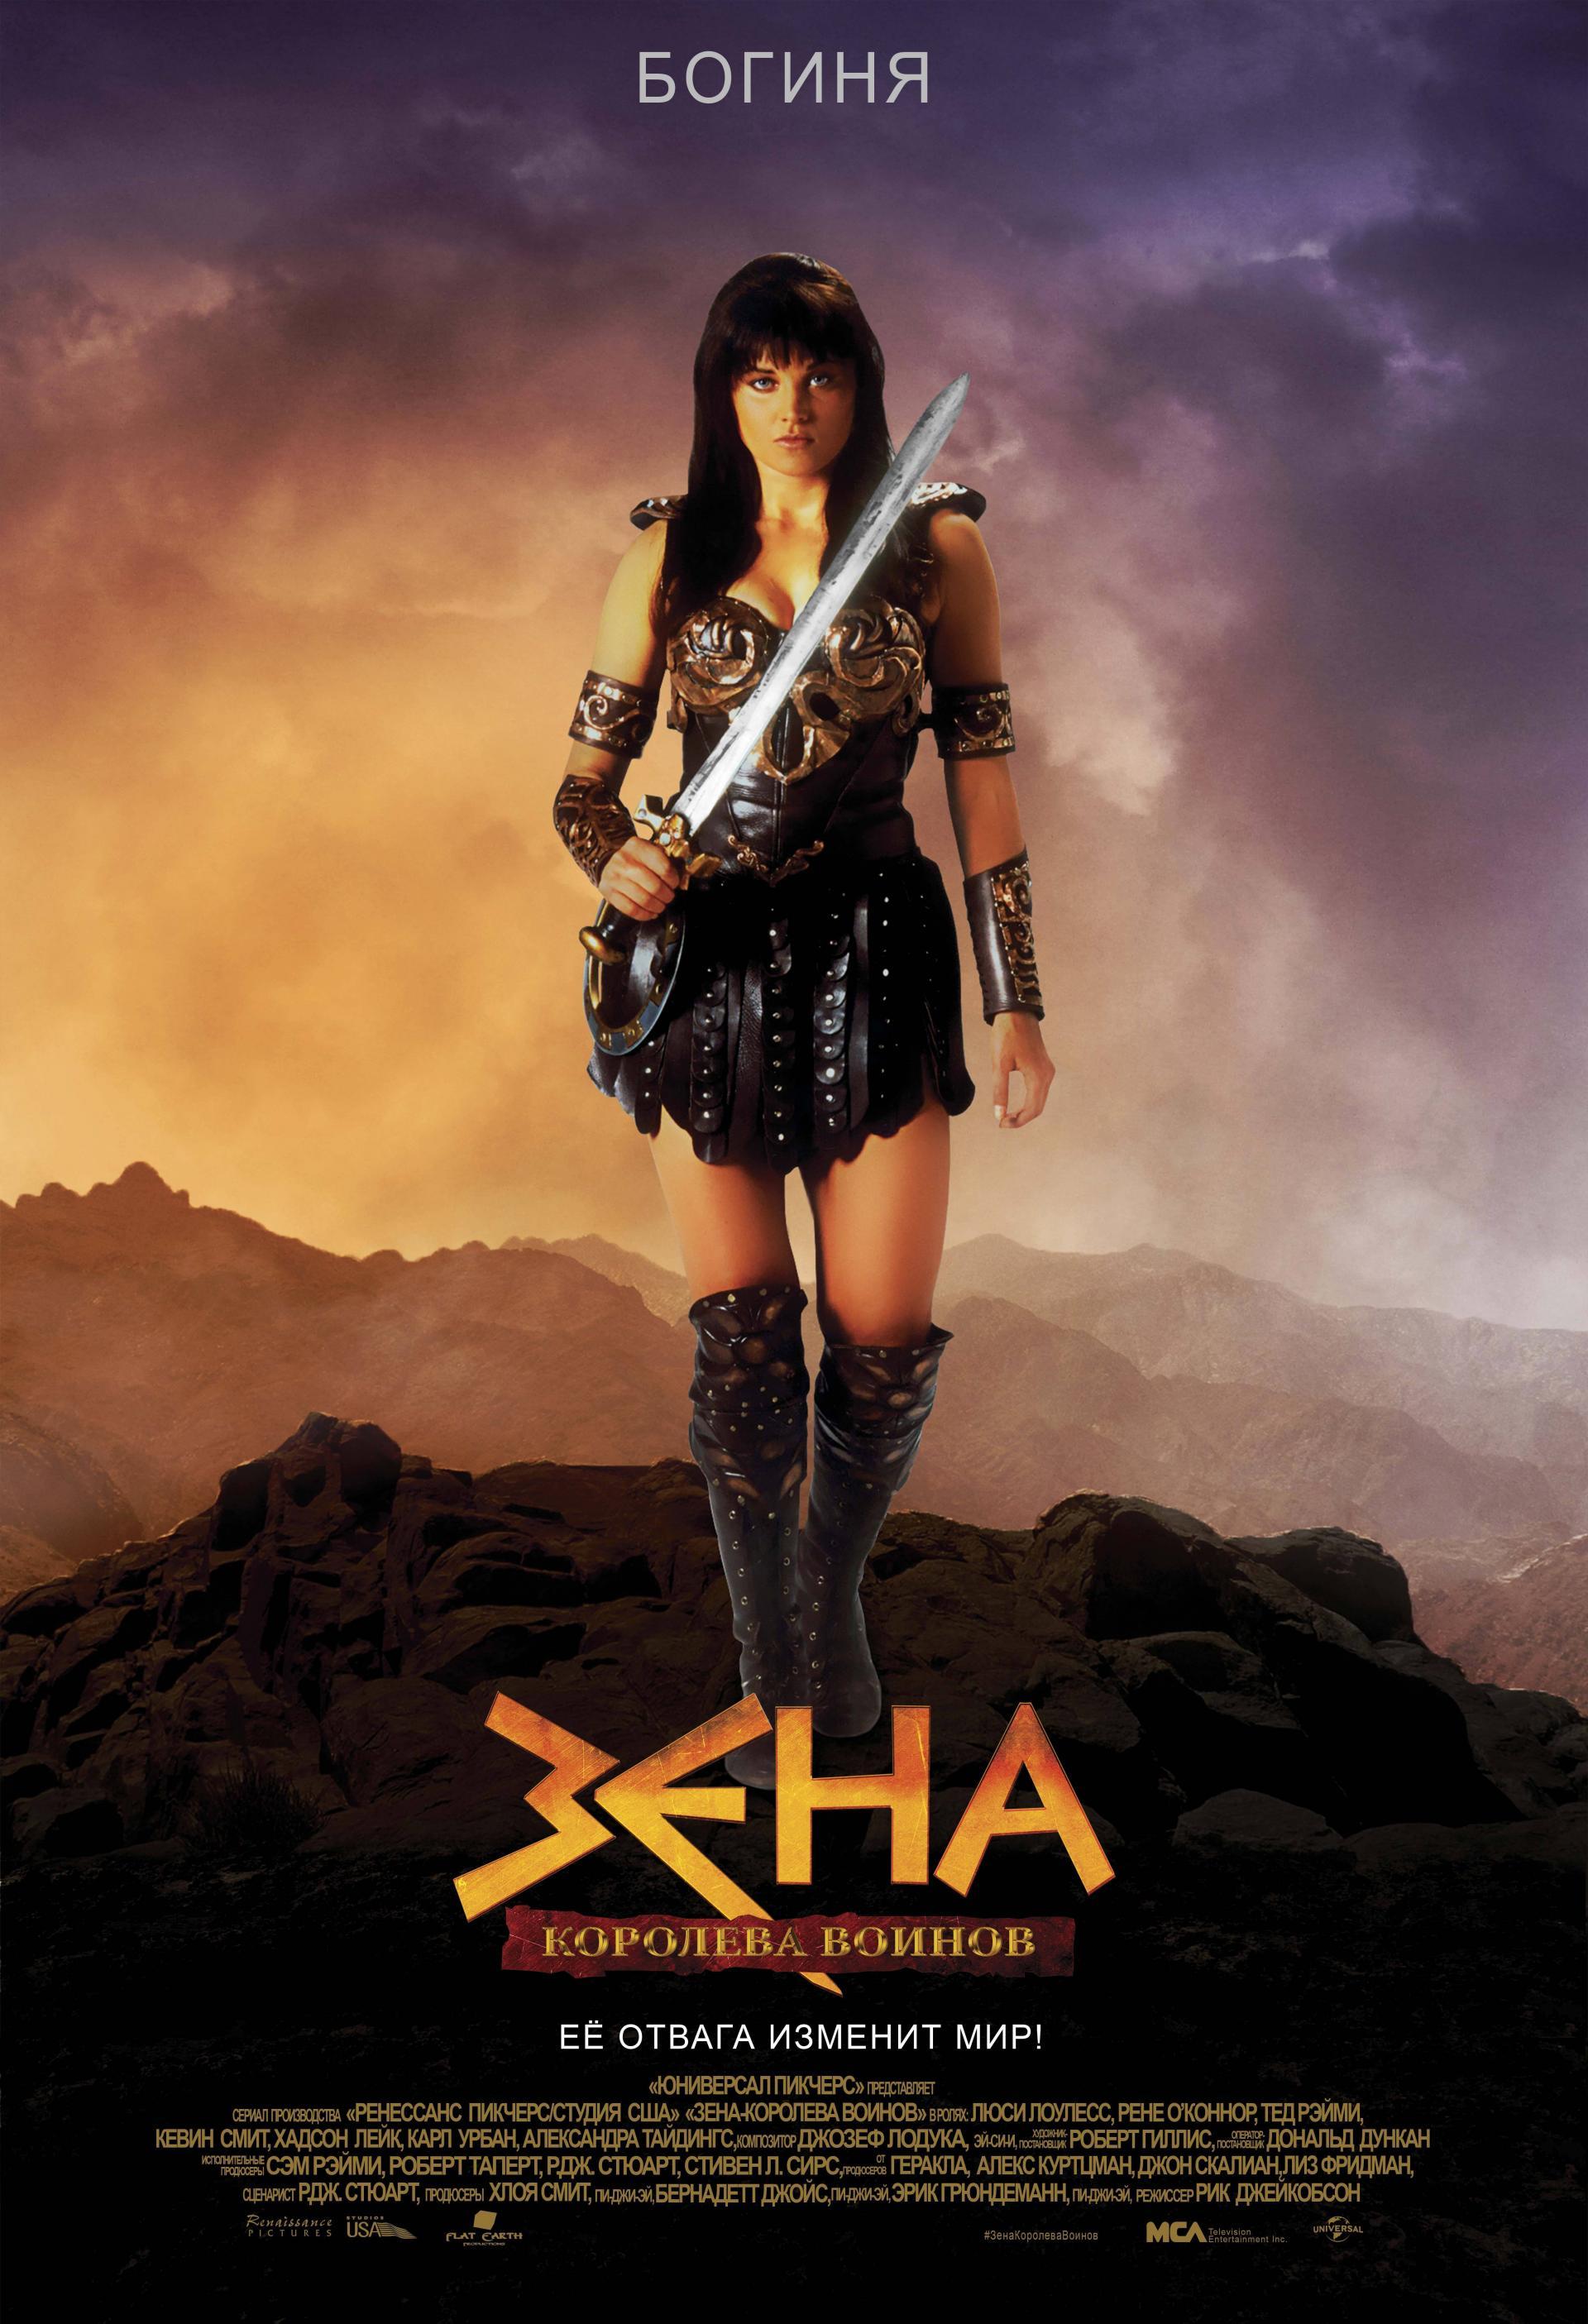 Зена - королева воинов | Xena: Warrior Princess | KINOMANIA.RU Зена Королева Воинов Актеры